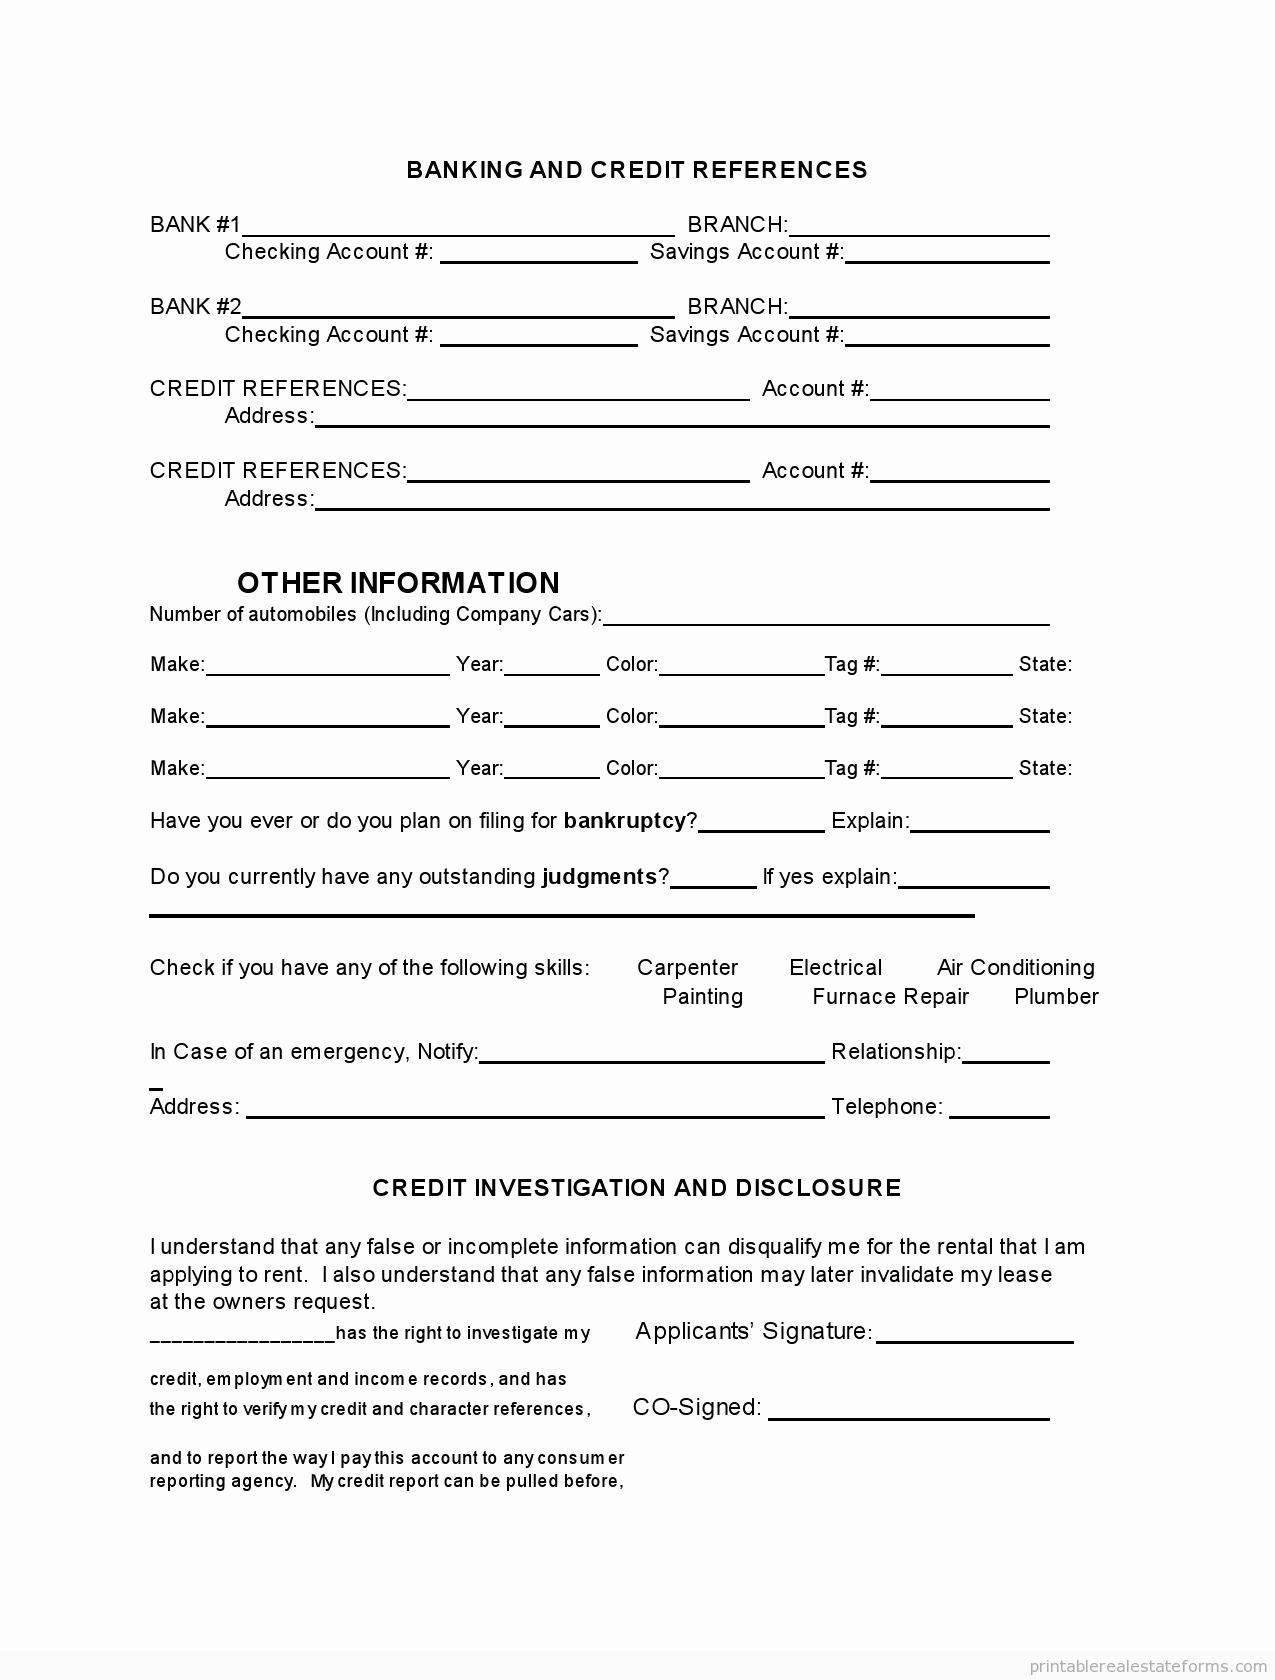 Tenant Information form Template Unique Printable Tenant Rental Application Template 2015